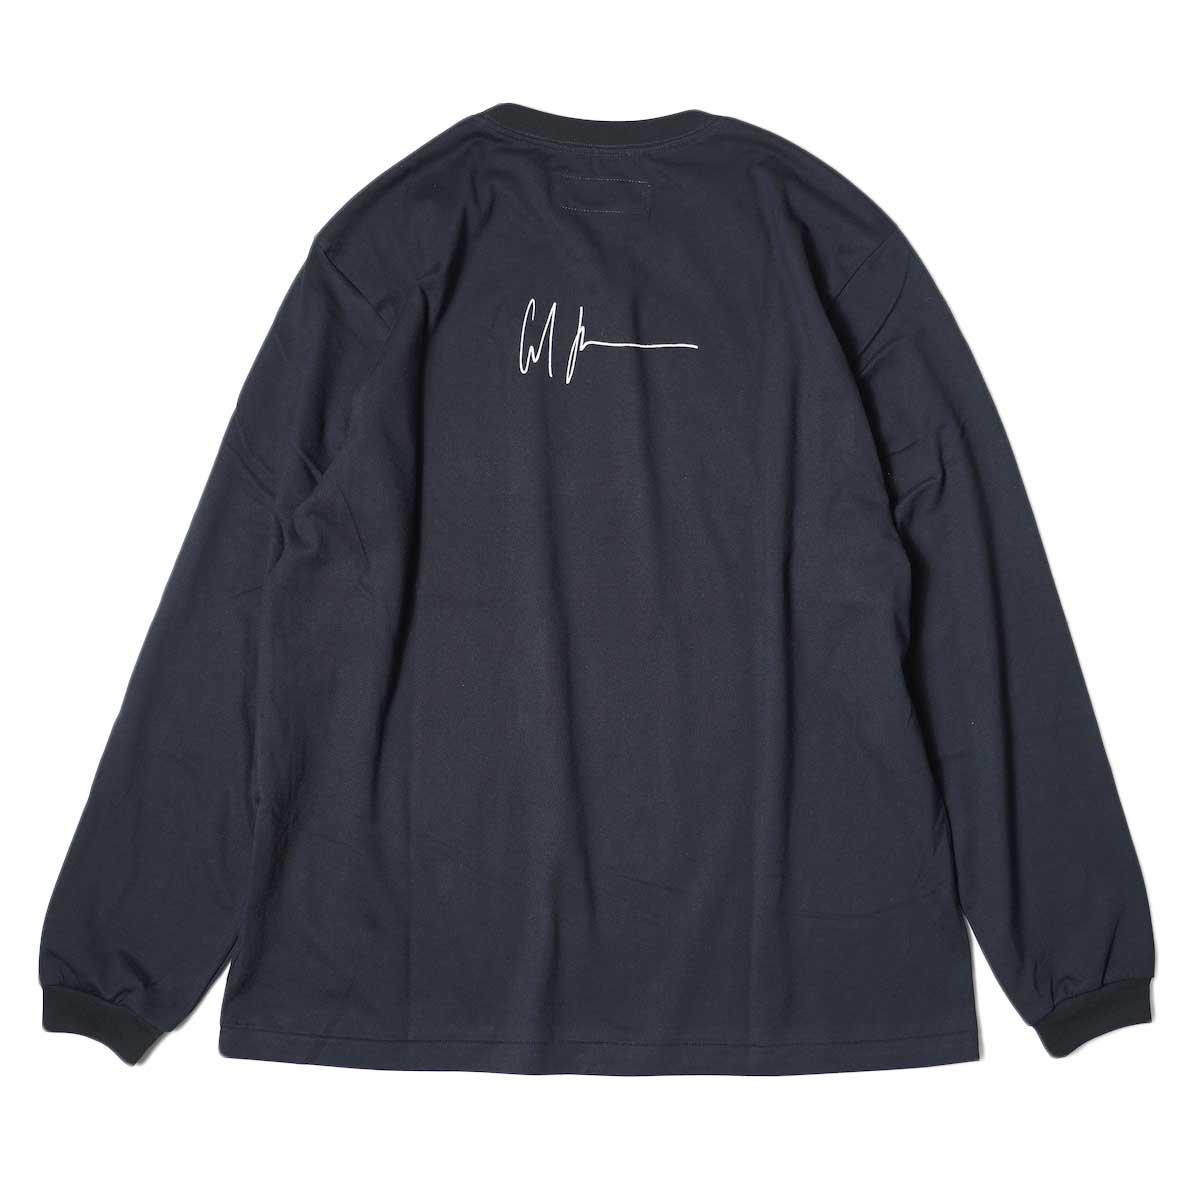 JANE SMITH / CADILLAC PLYMOUTH L/S T-Shirt (Black) 背面